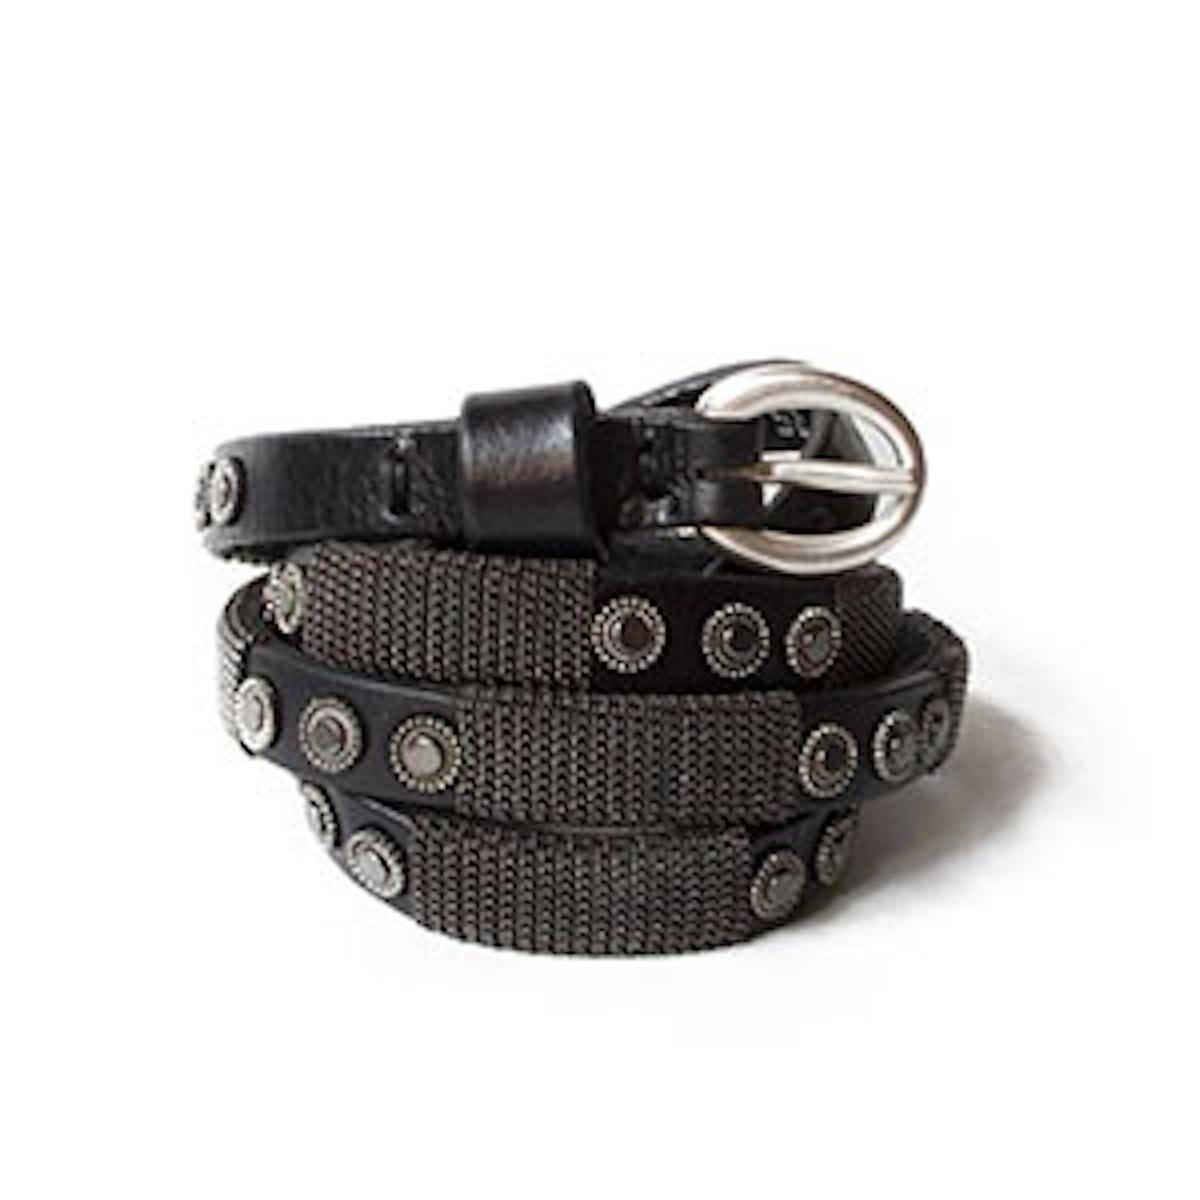 Puntovida Thin Studded Belt